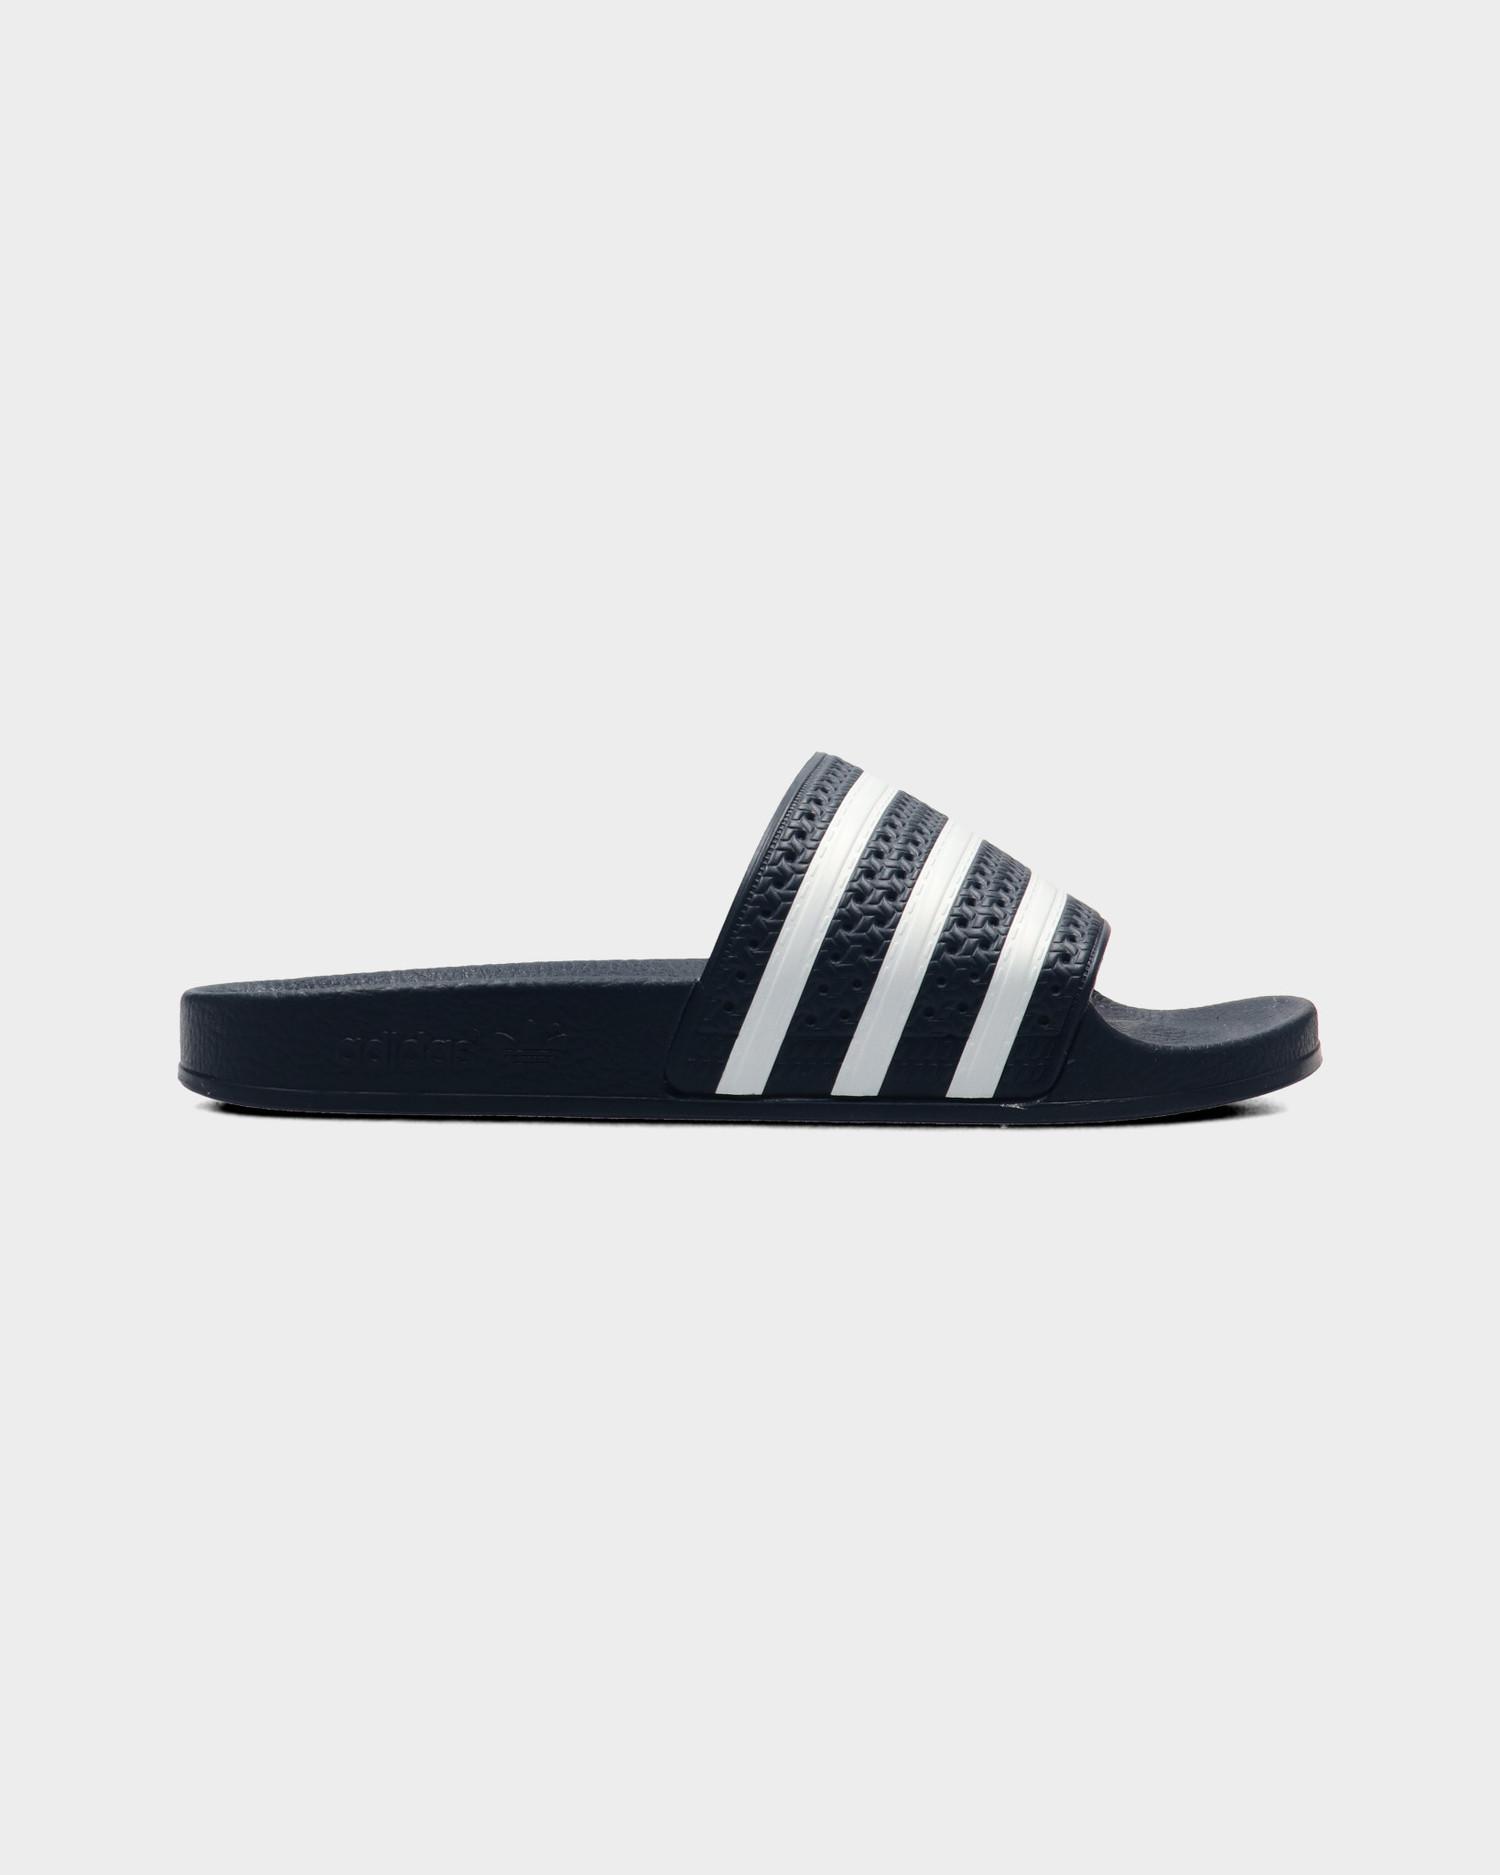 Adidas Adilette  AdiBlu/White/AdiBlu